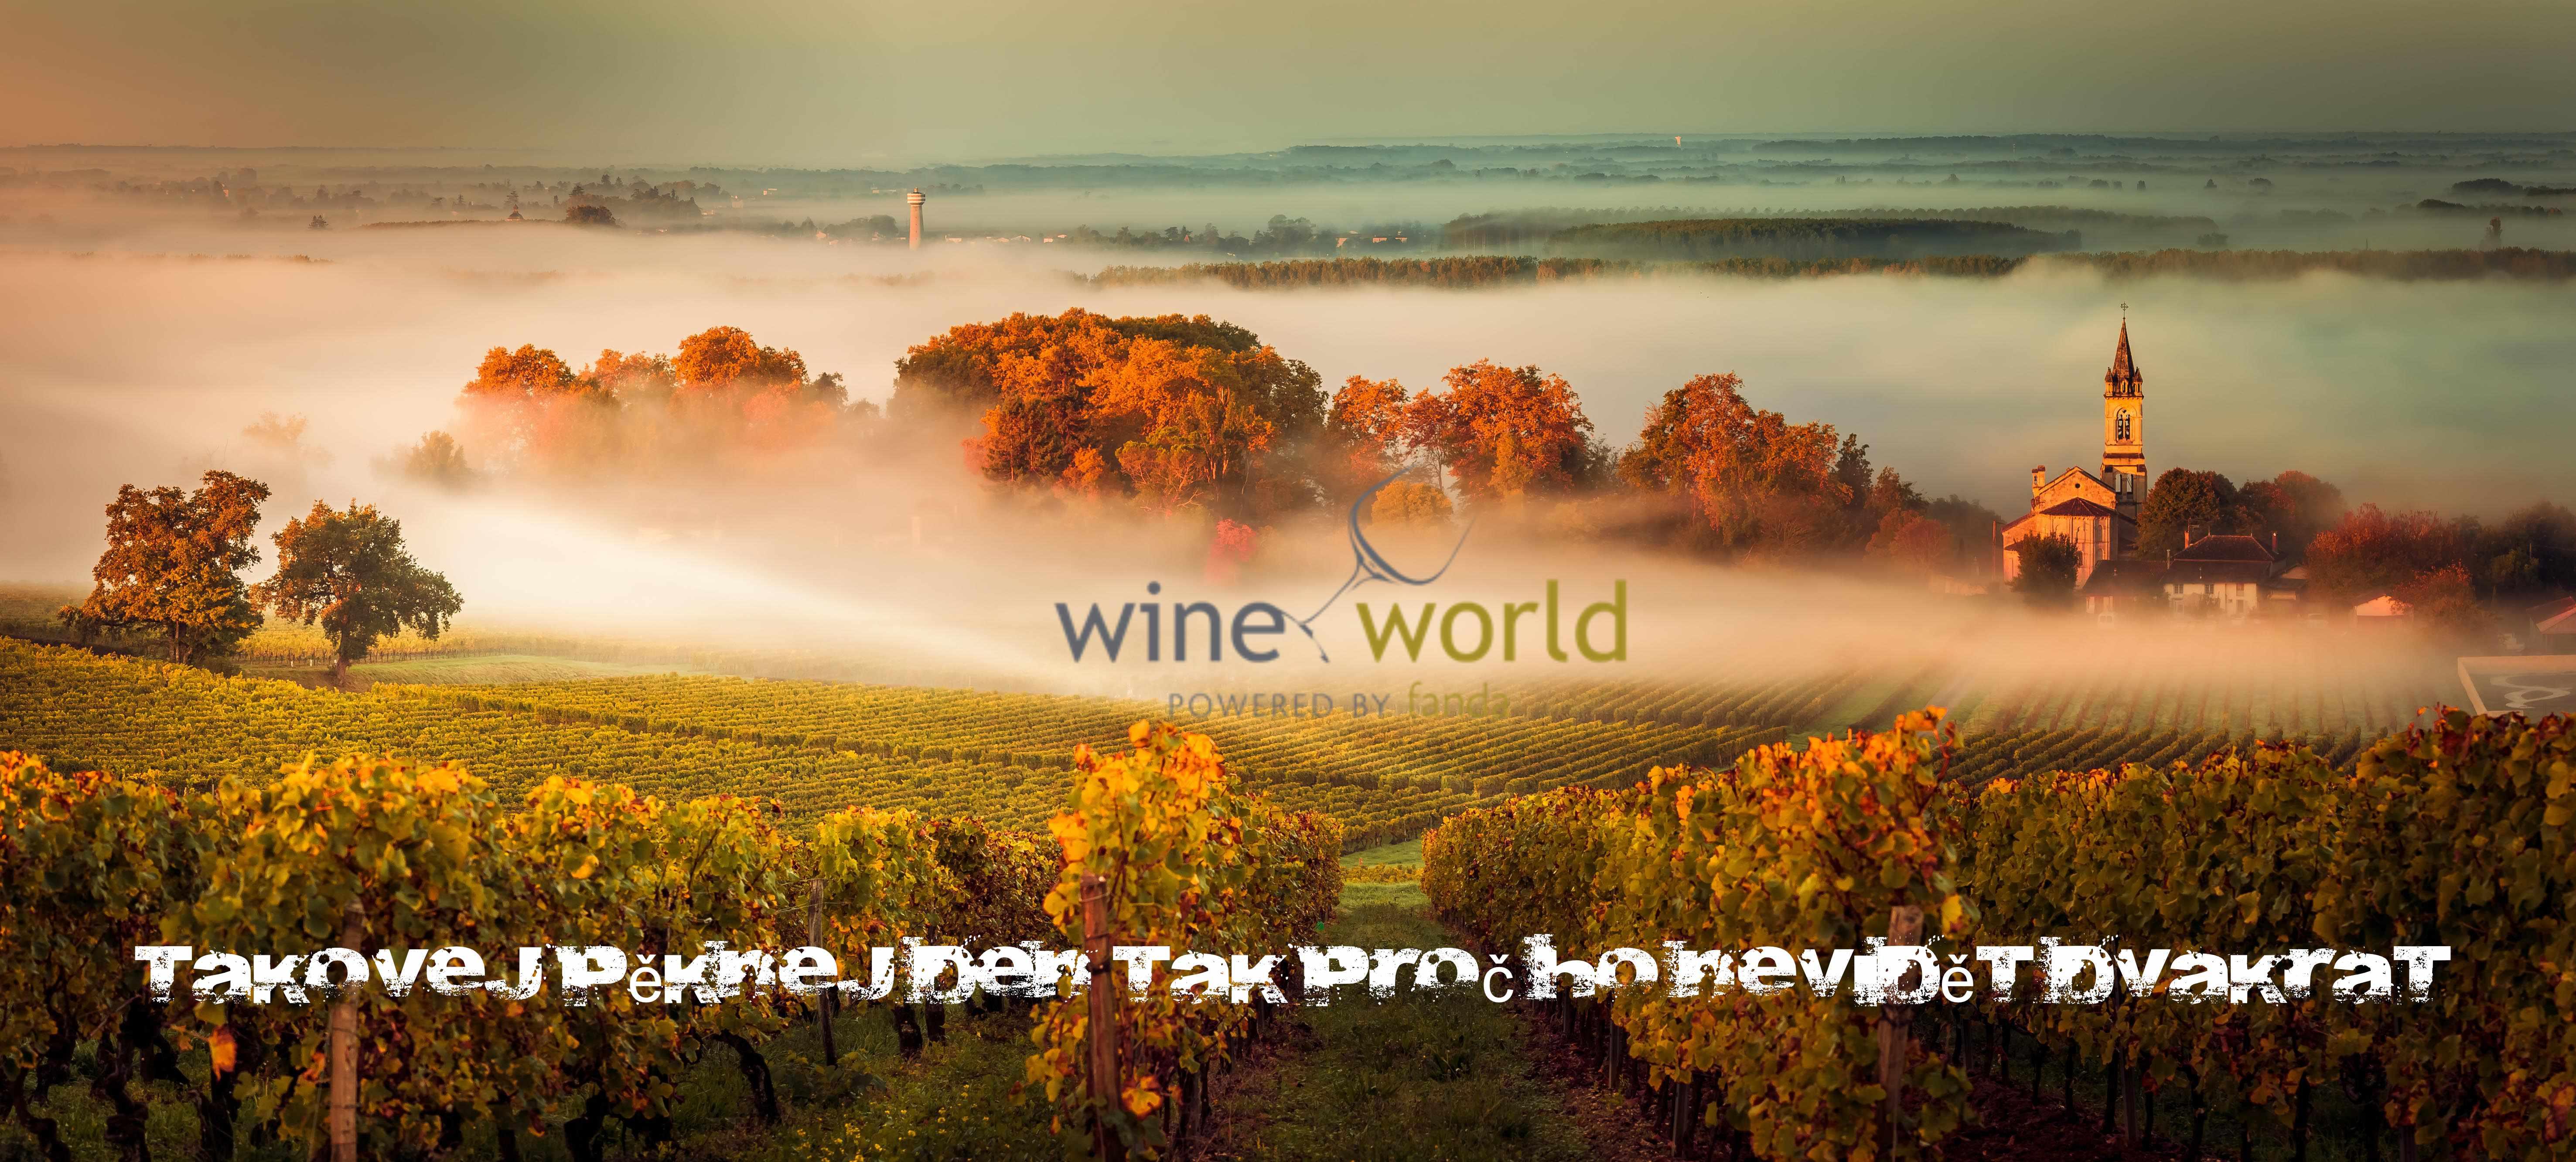 vinice s mlhou